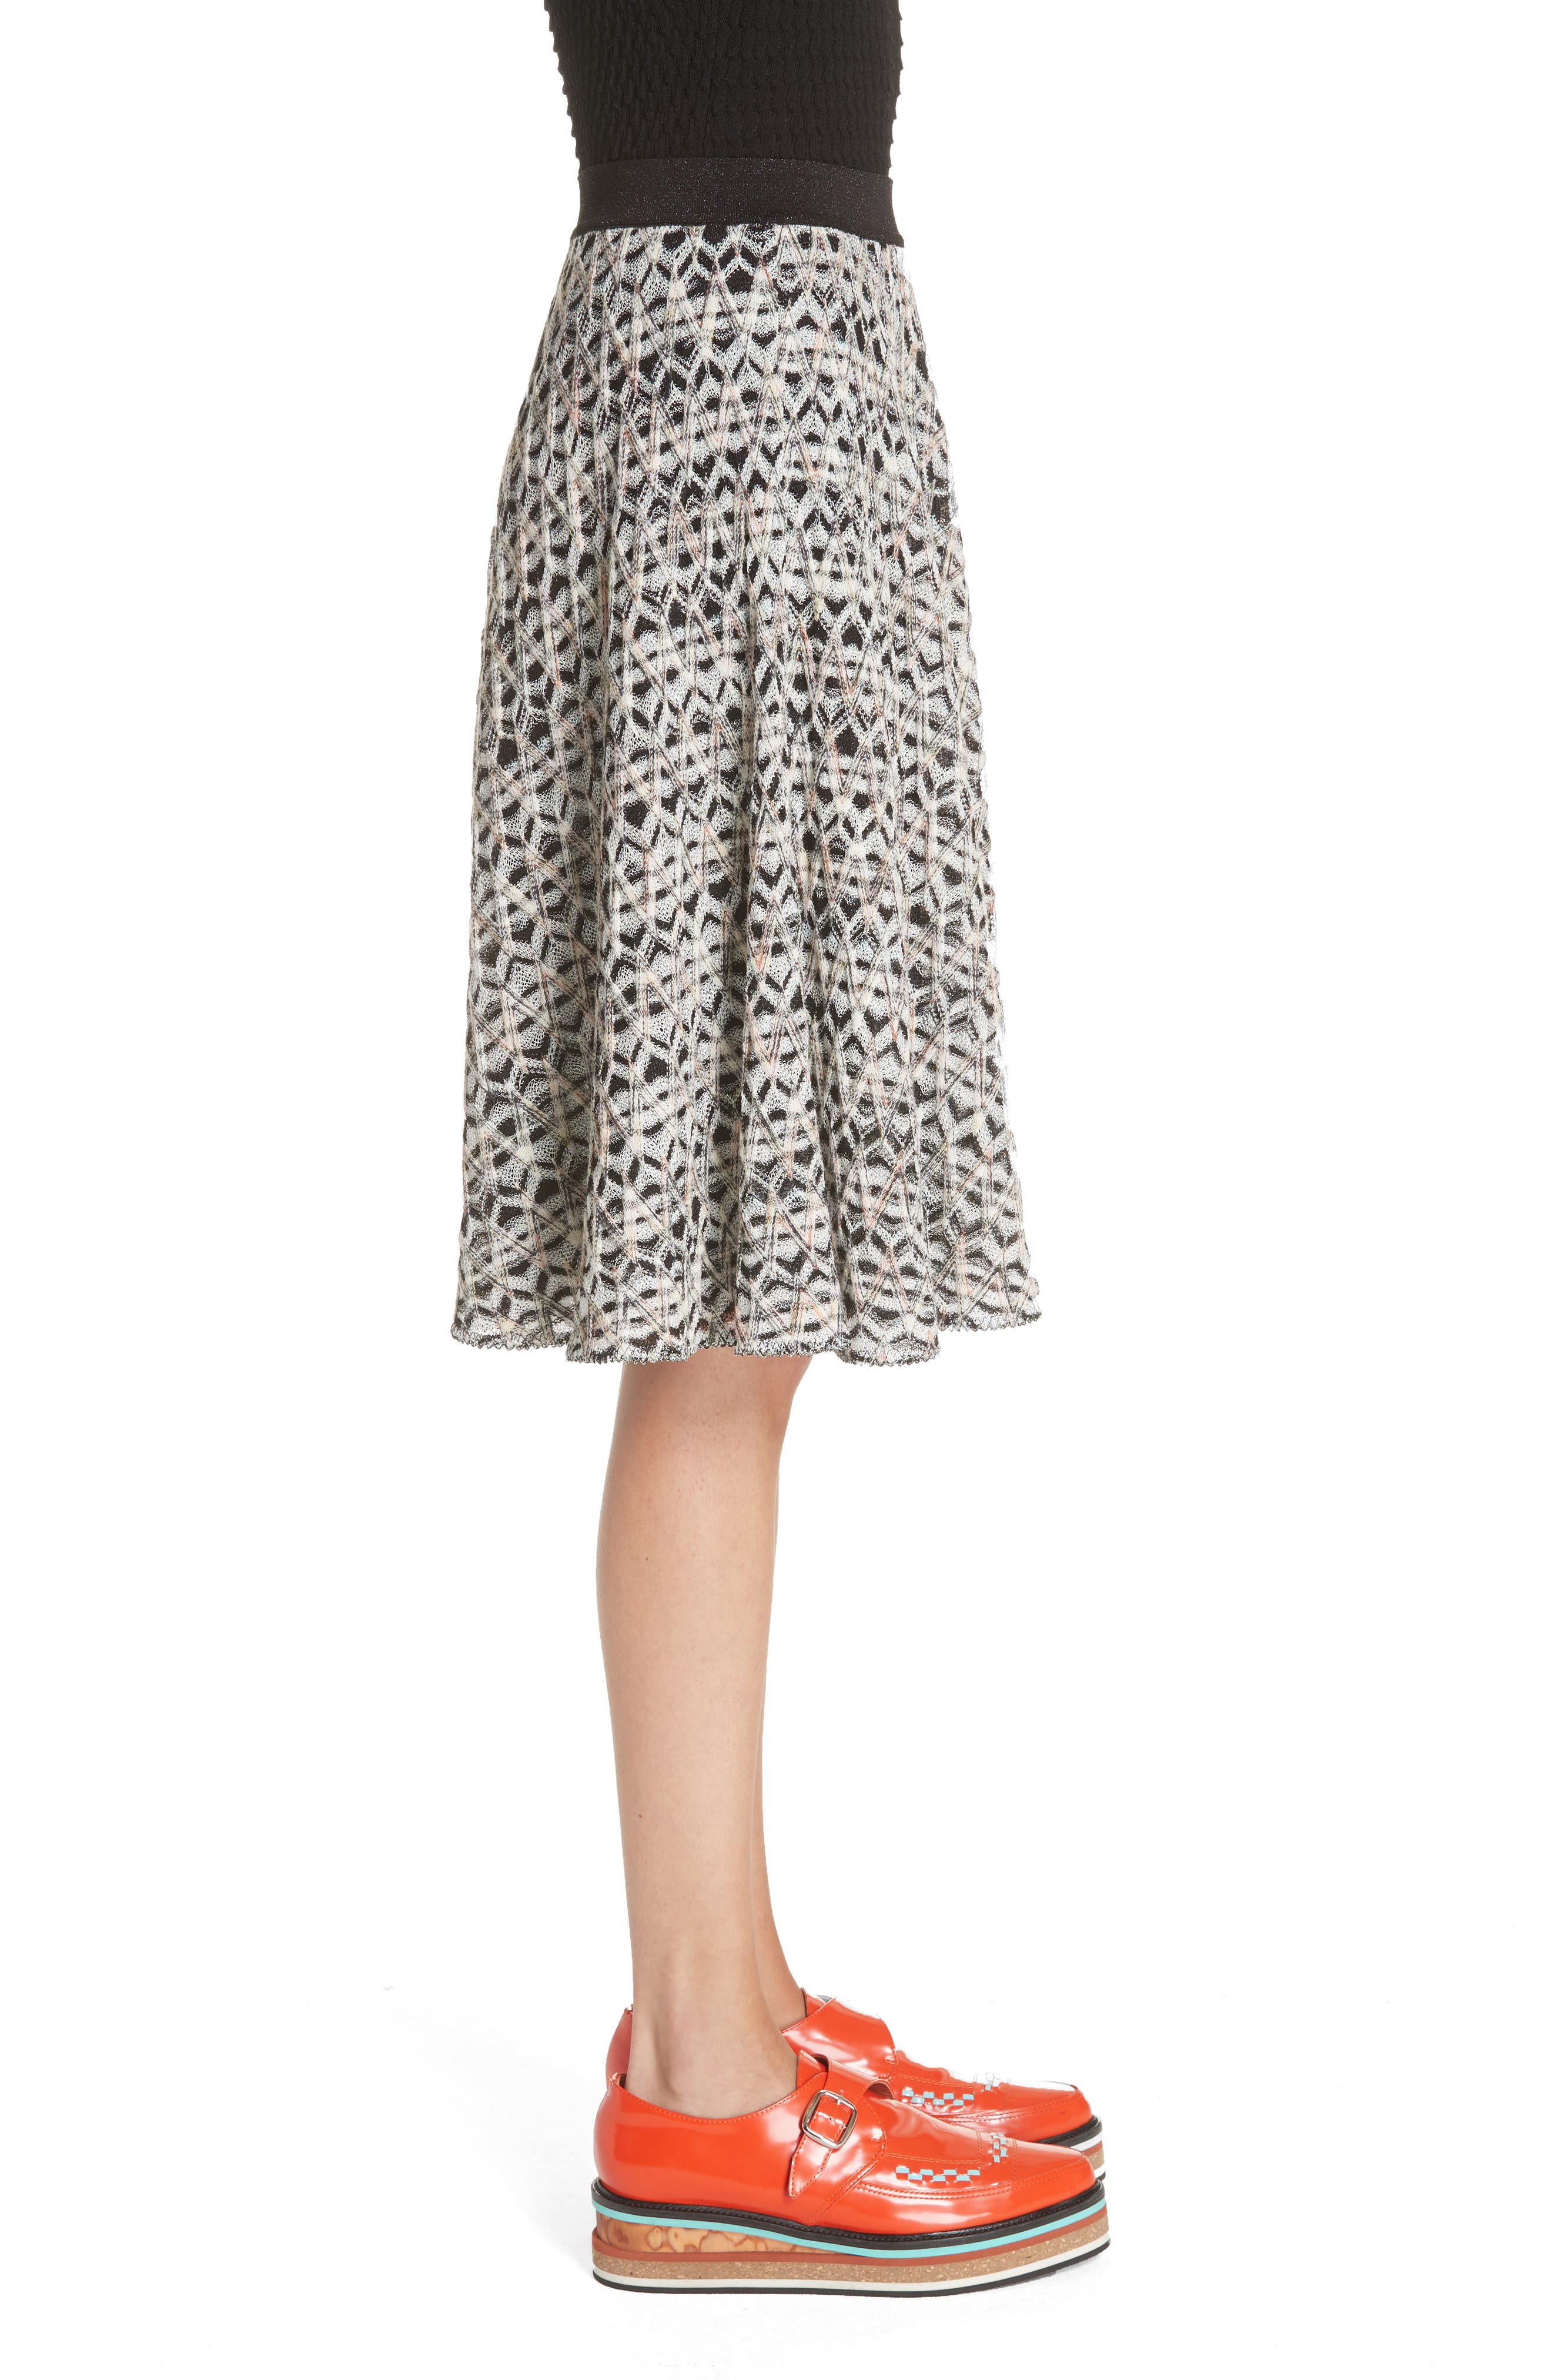 MISSONI, Zig Zag A-Line Skirt, Alternate thumbnail 3, color, MULTI